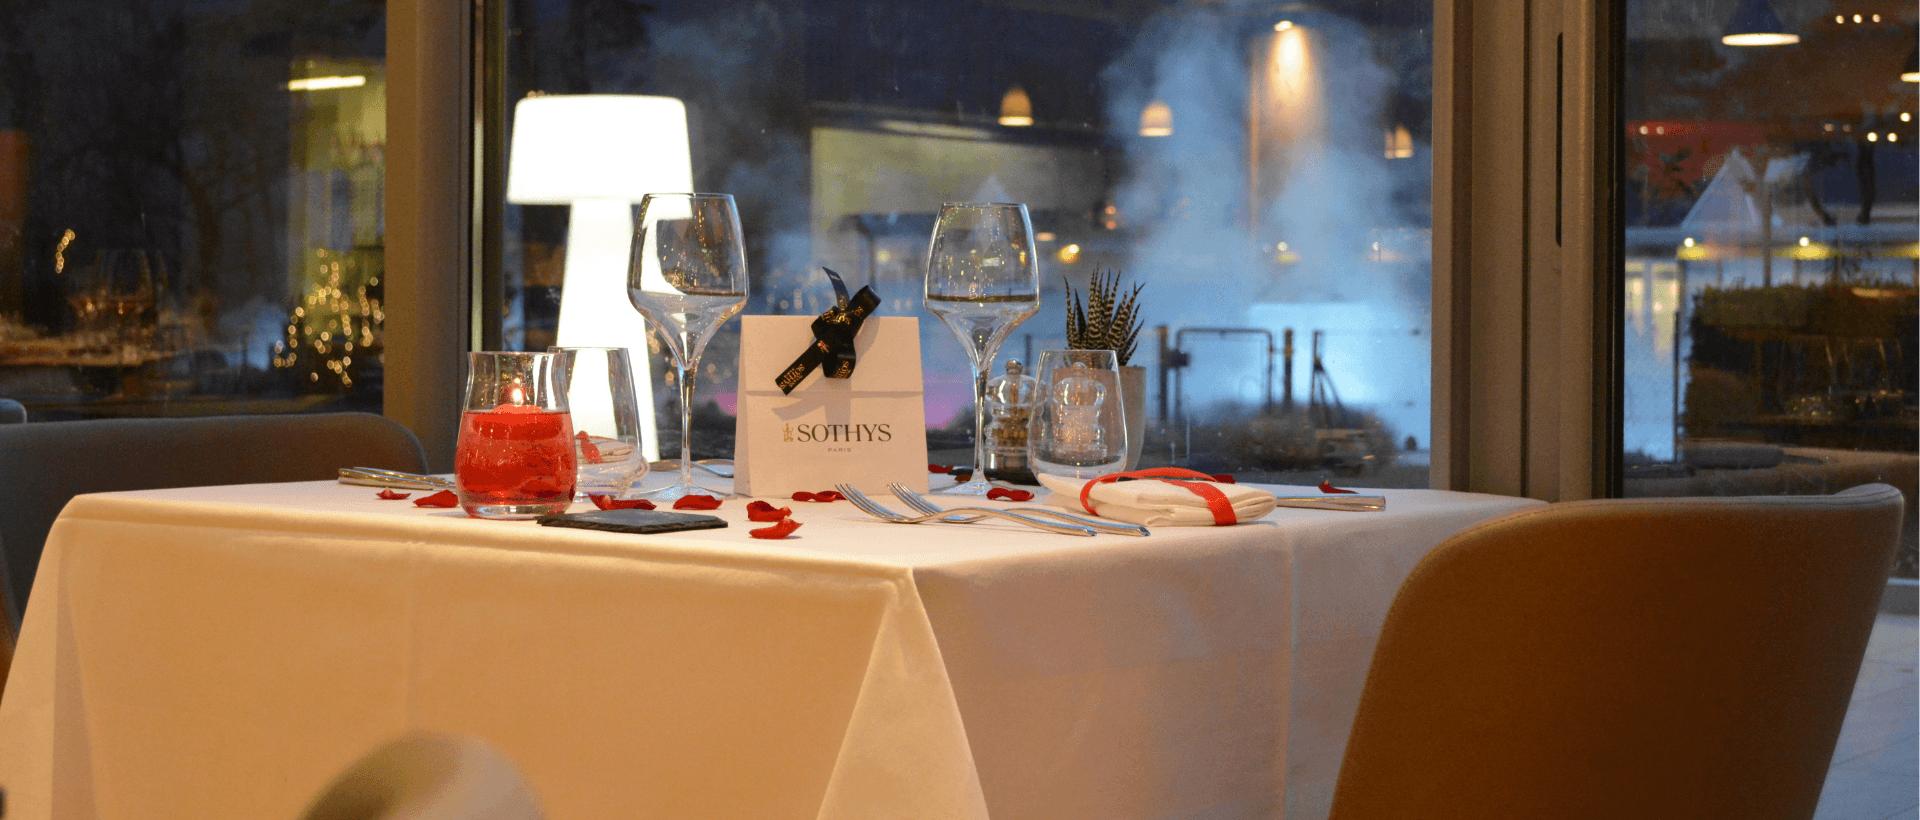 Buffet spécial Saint-Valentin